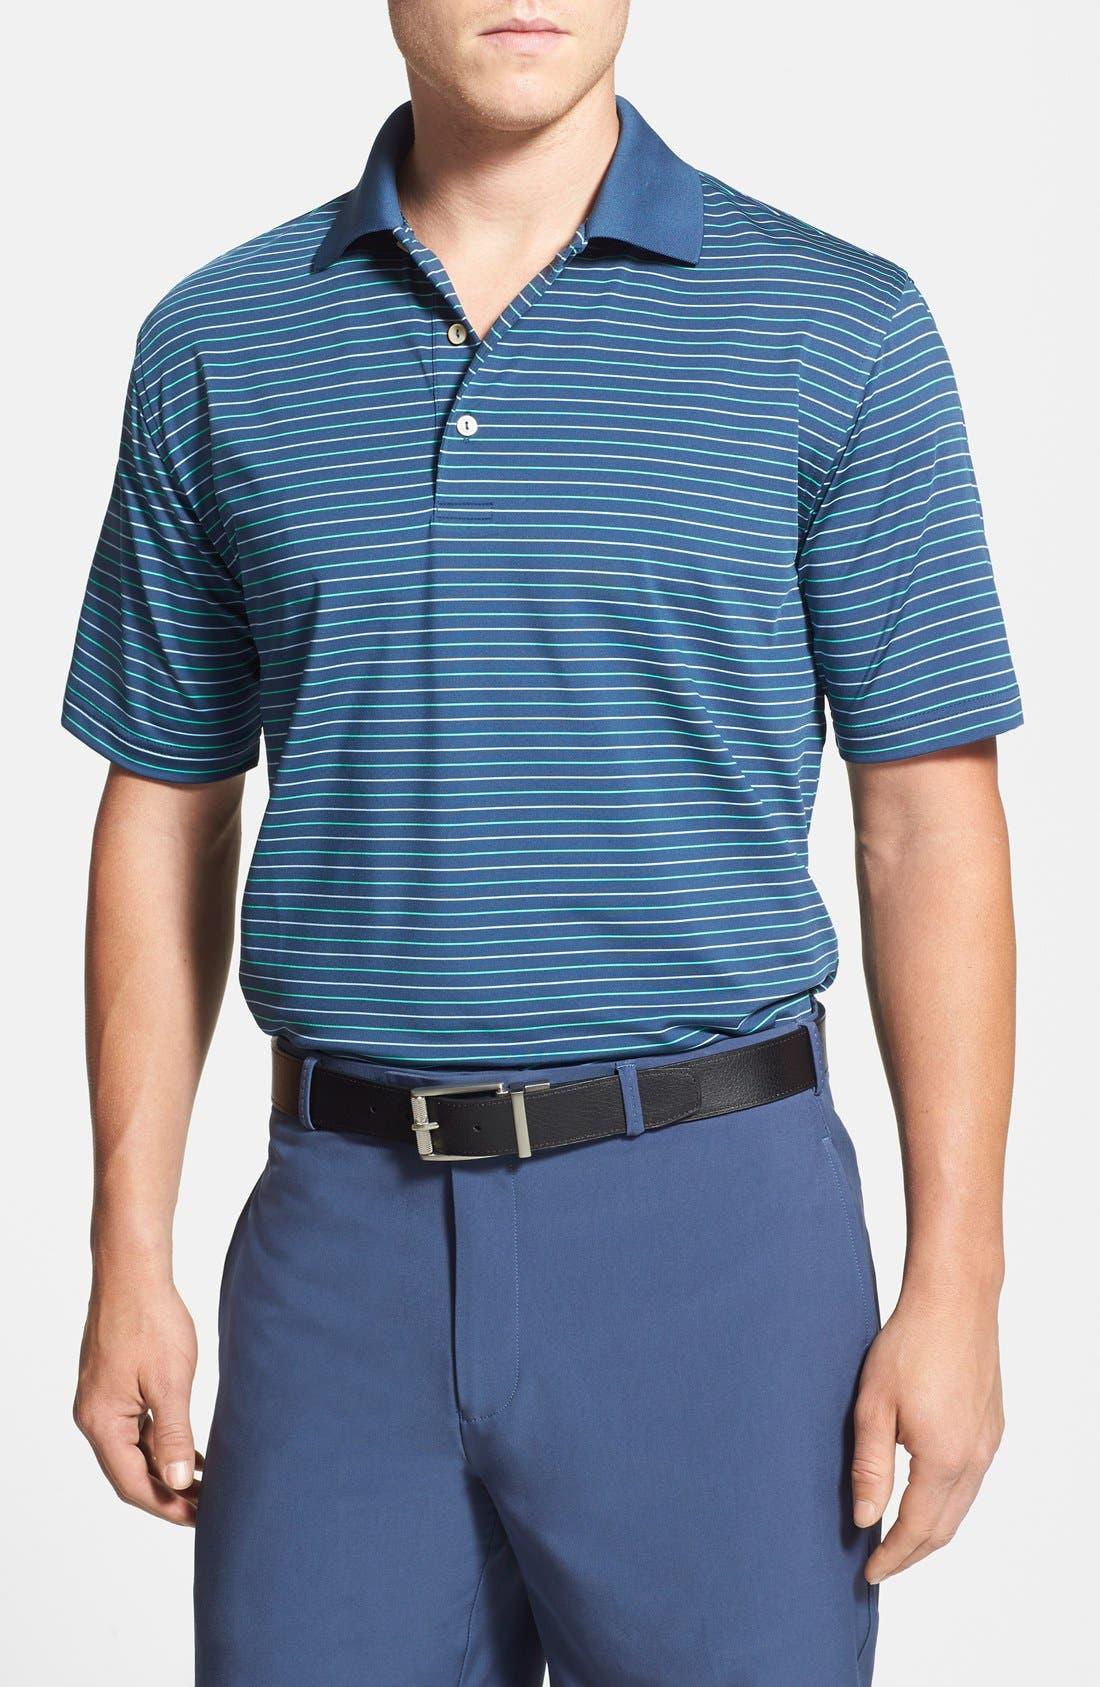 Alternate Image 1 Selected - Peter Millar 'Harnett' Stripe Stretch Jersey Polo